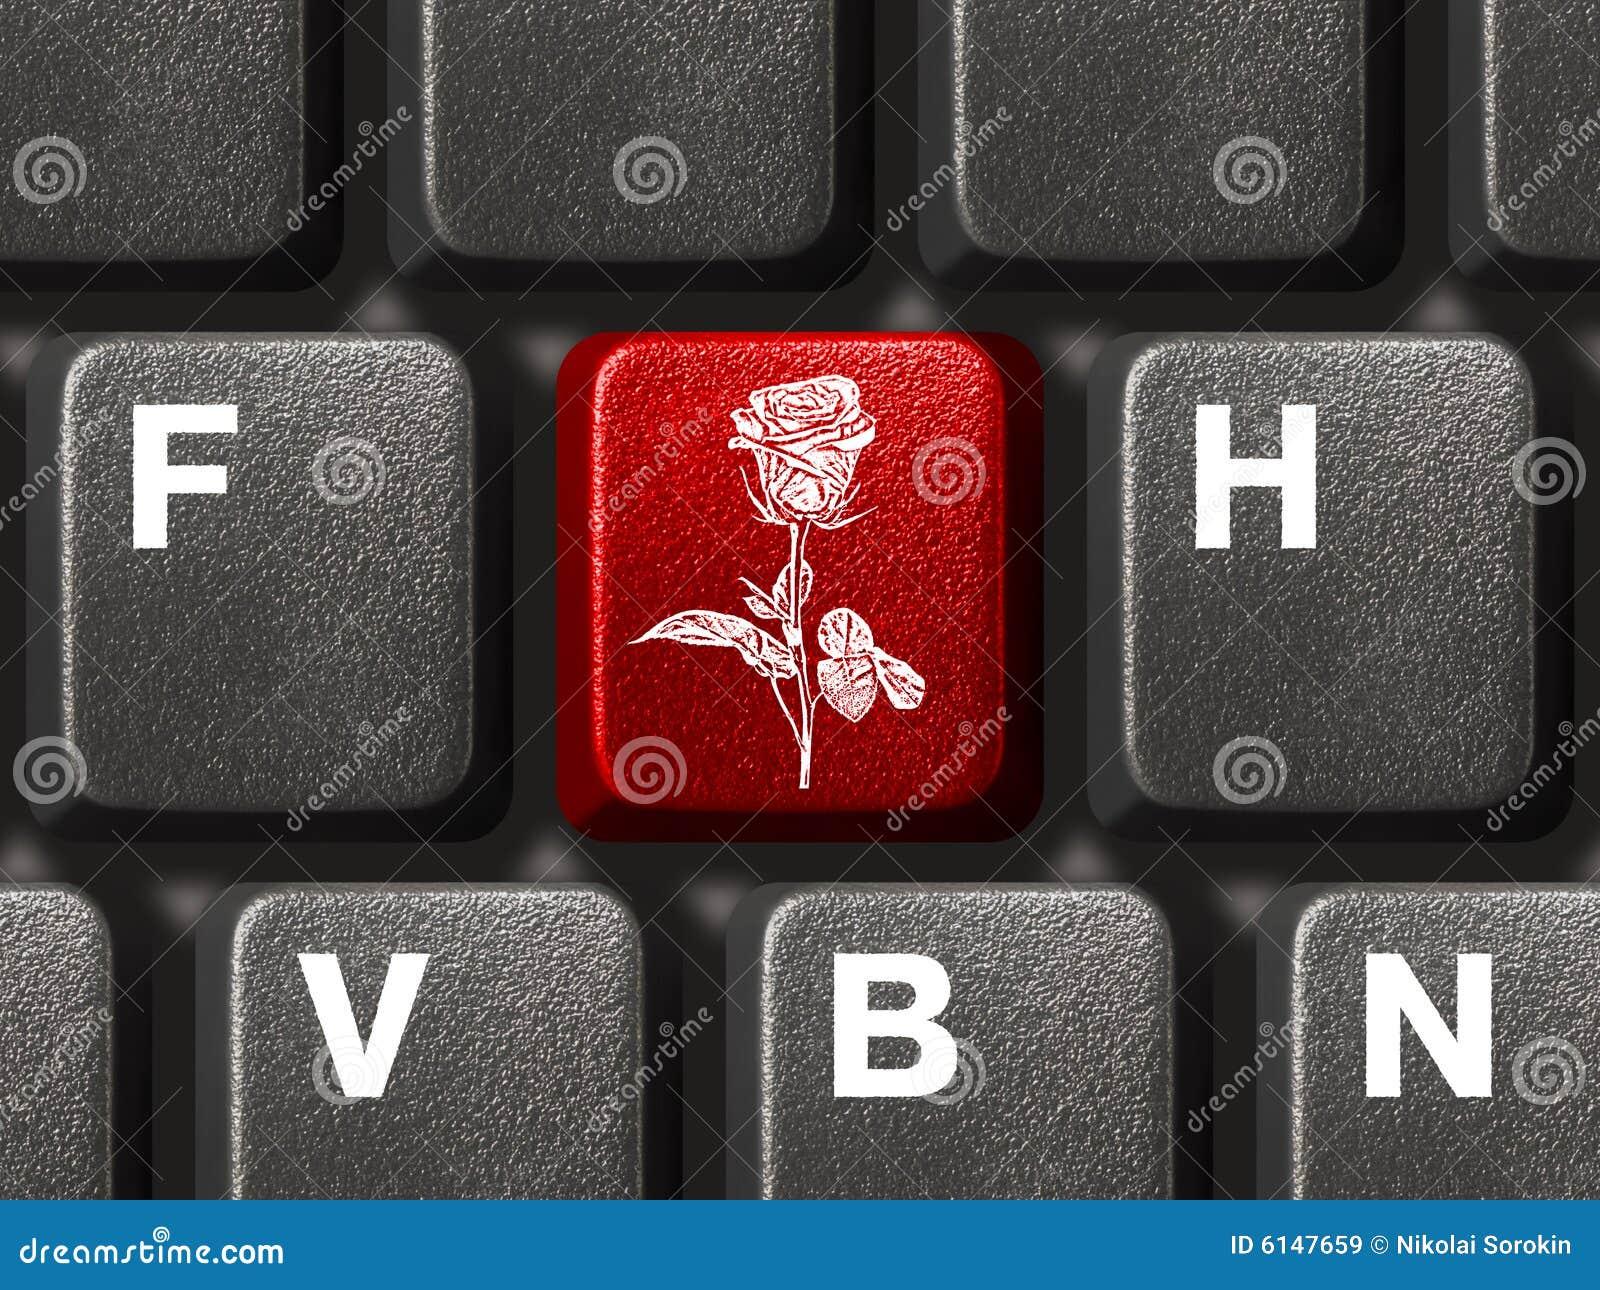 Pc Keyboard With Flower Key Stock Image Image Of Decoration